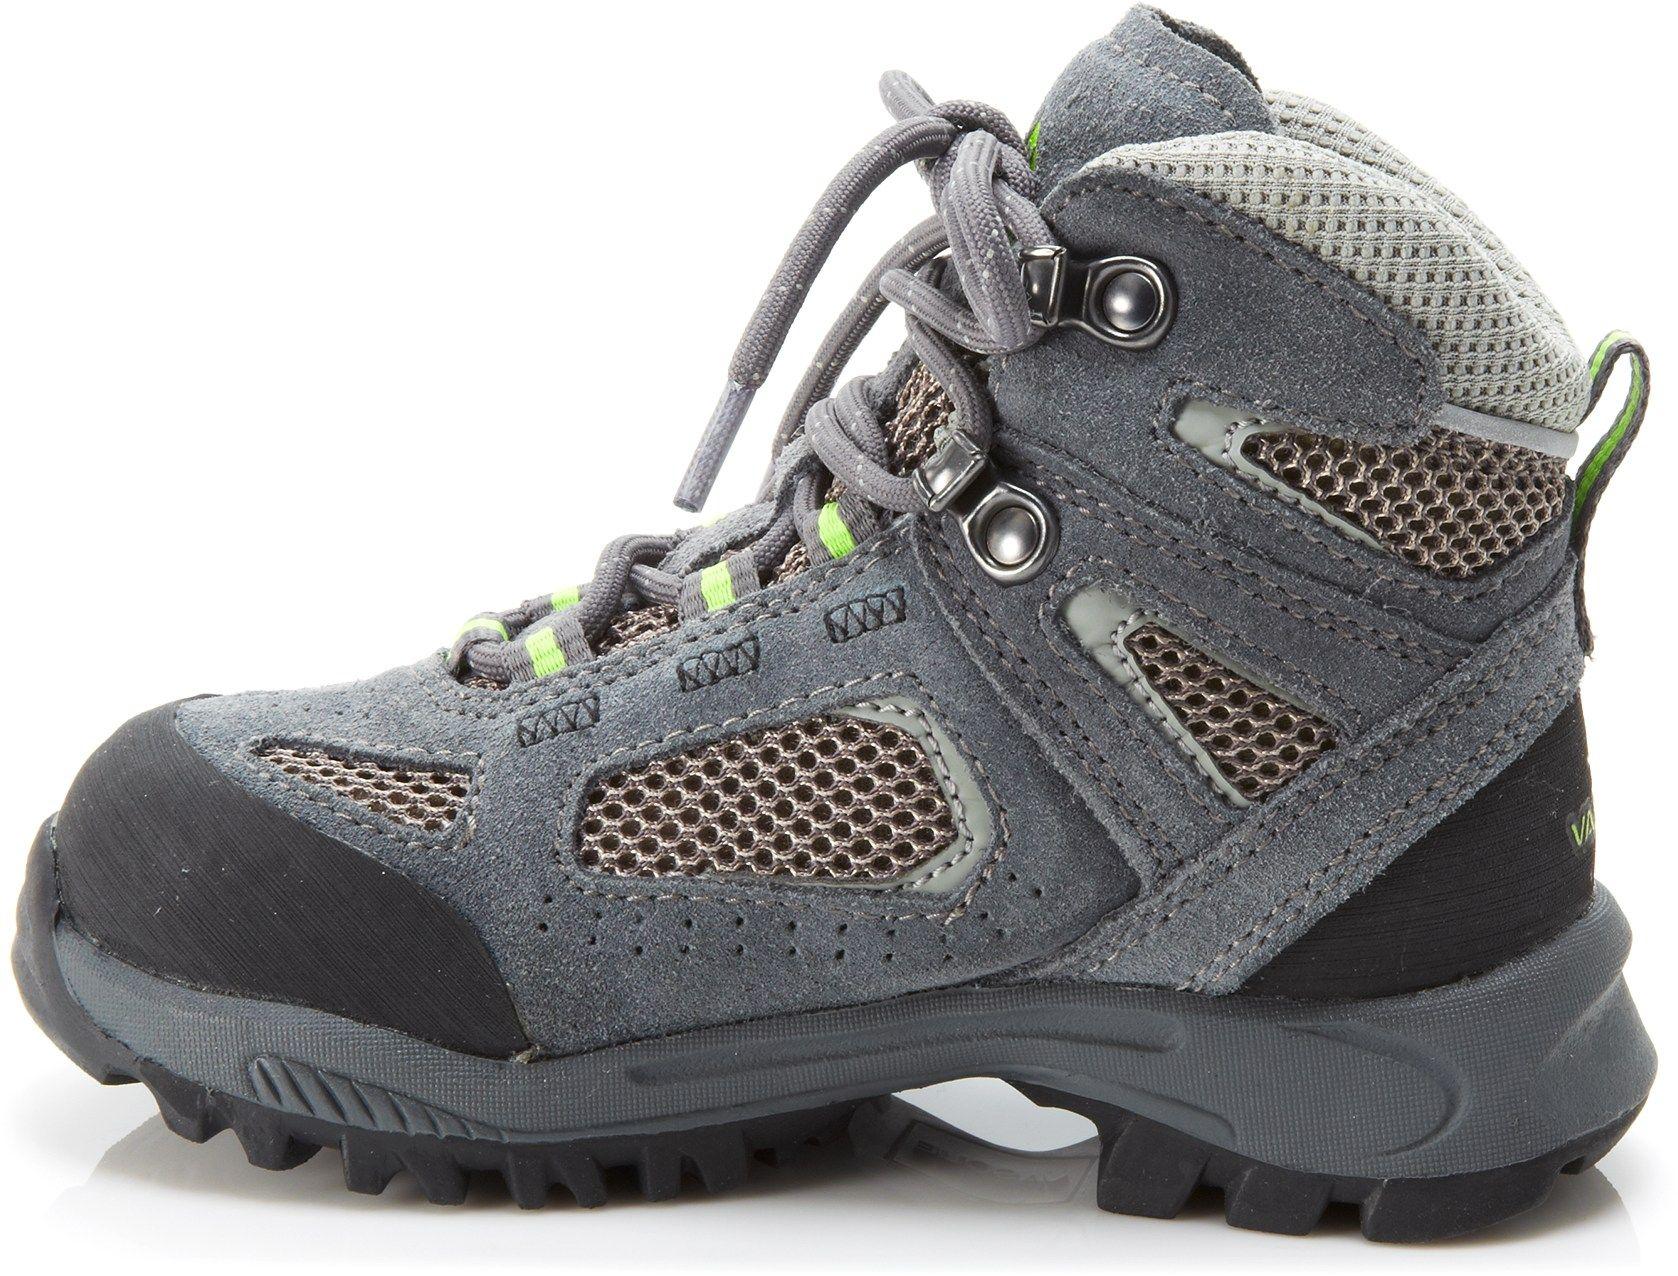 e7cbe29fddb Vasque Breeze 2.0 Waterproof Hiking Boots - Kids' - REI.com   All ...